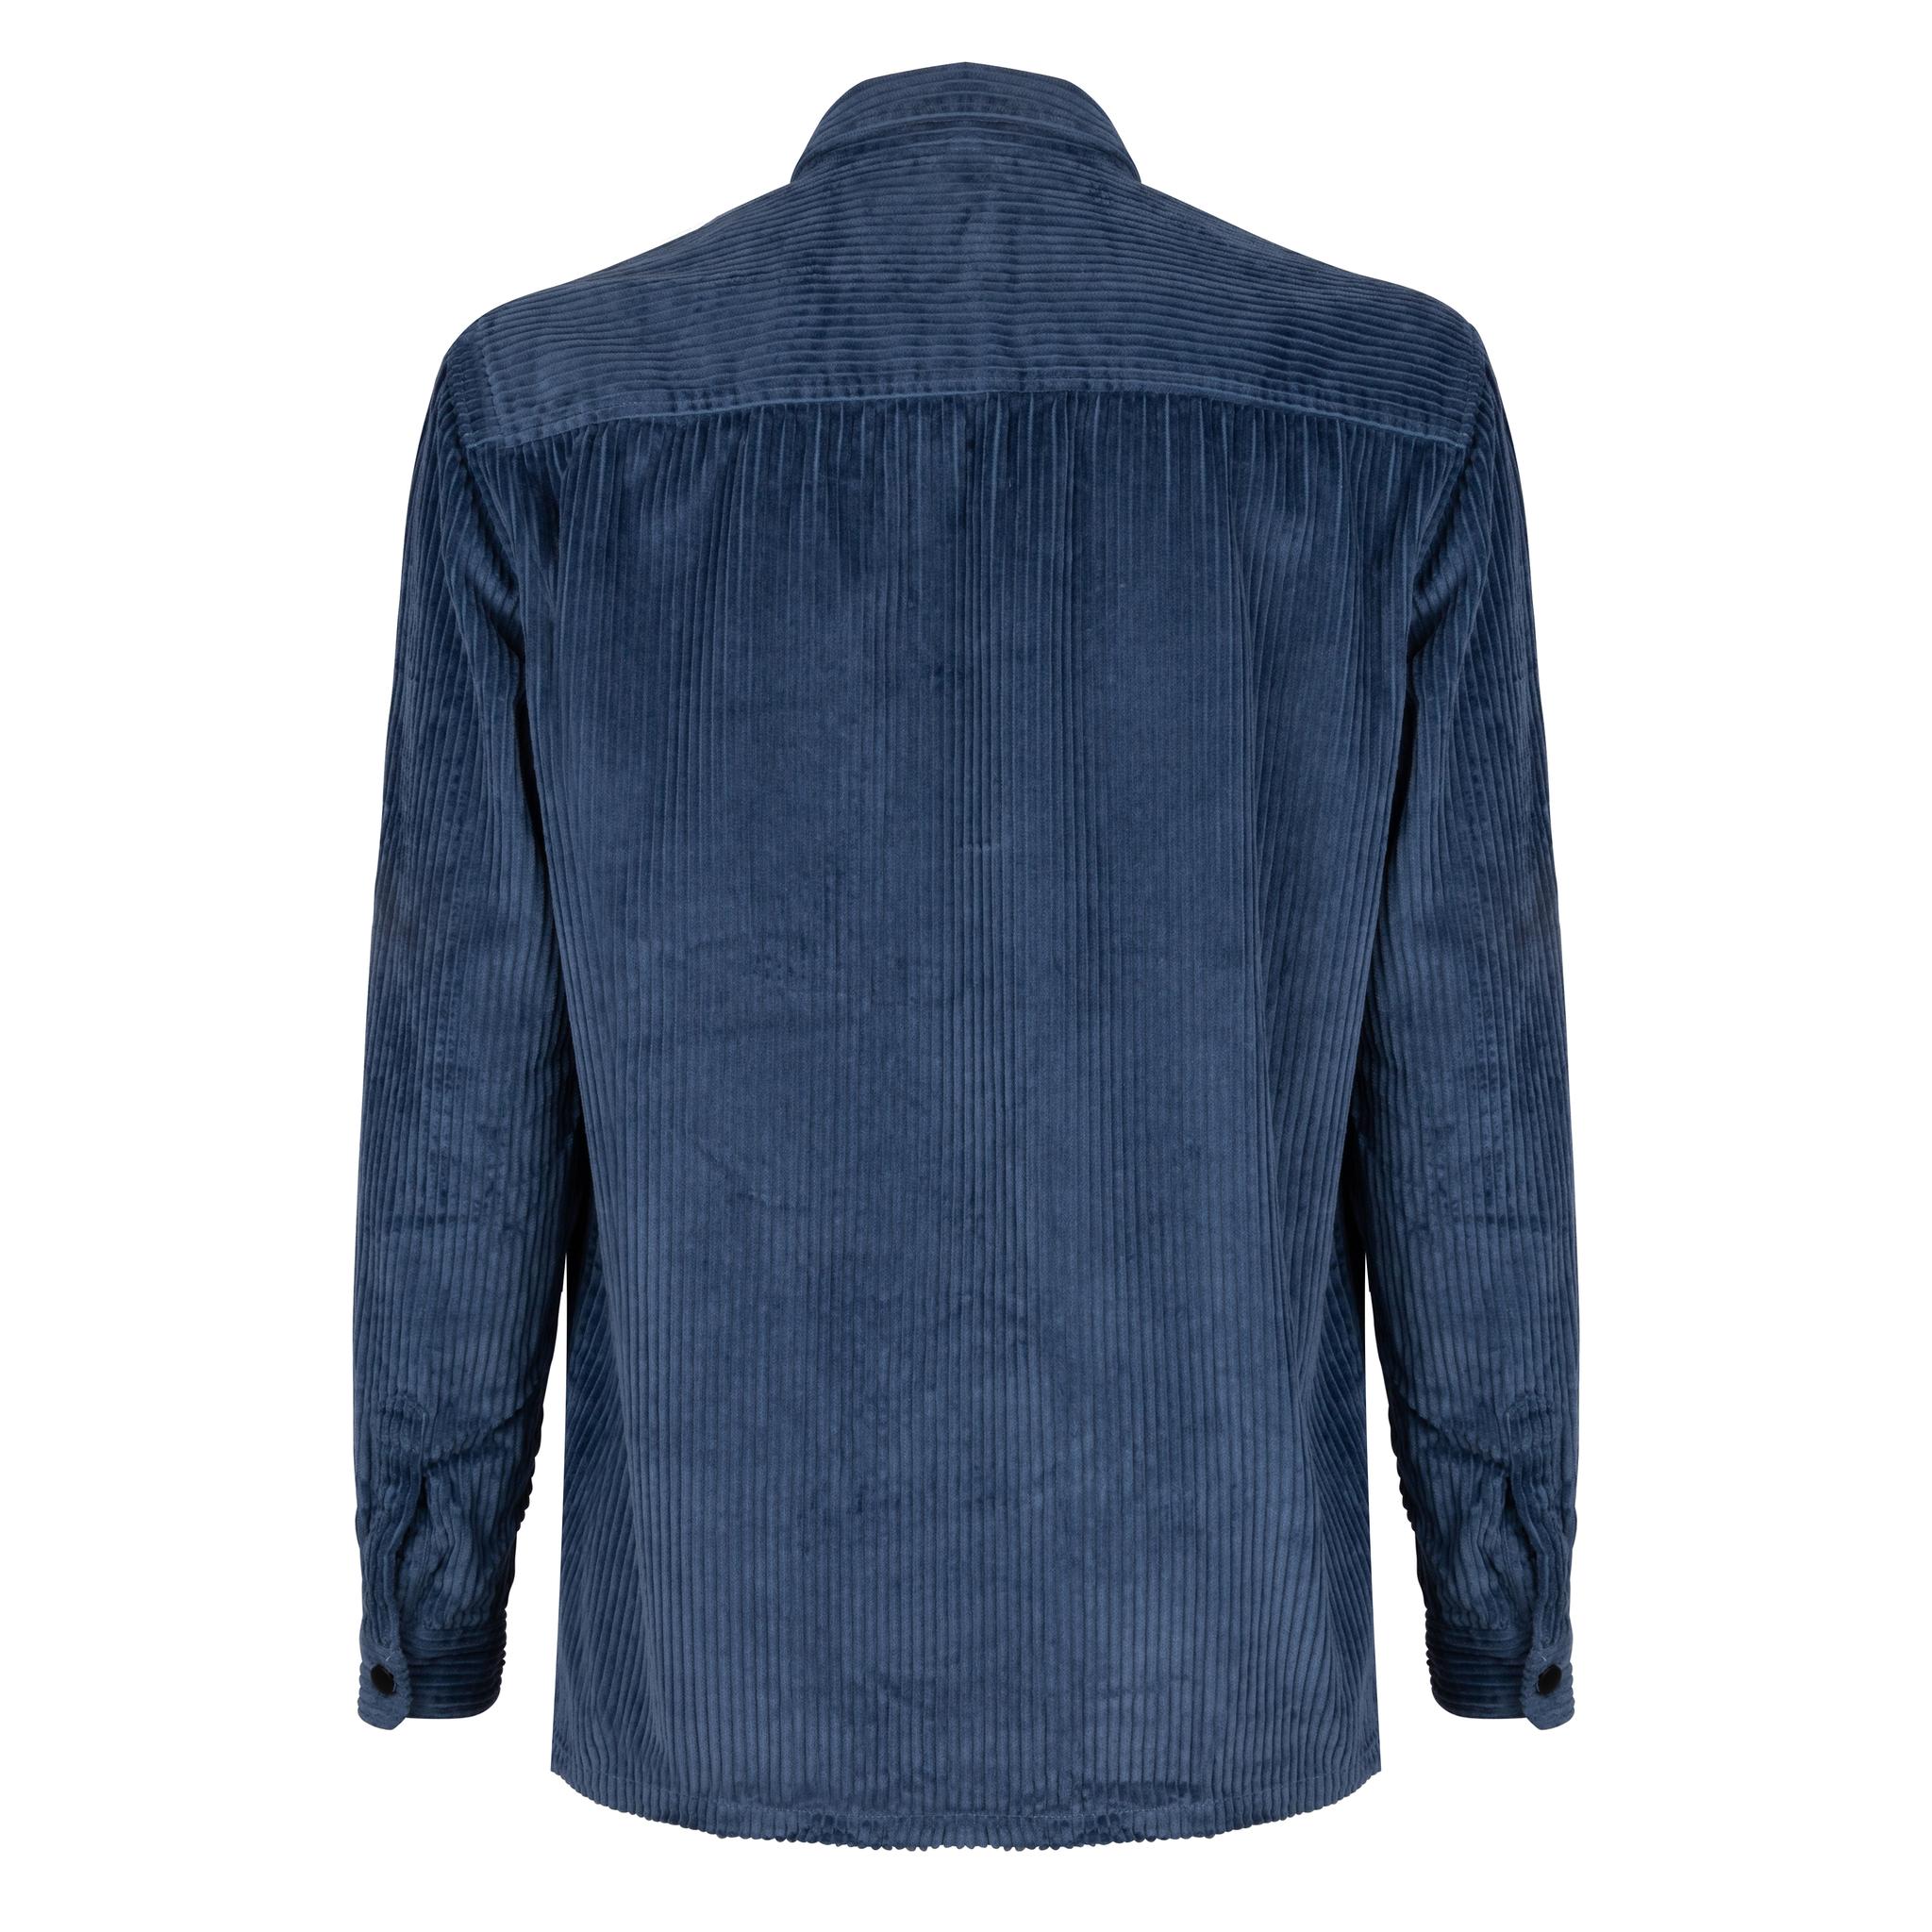 Lofty Manner Blue Shirt Jair